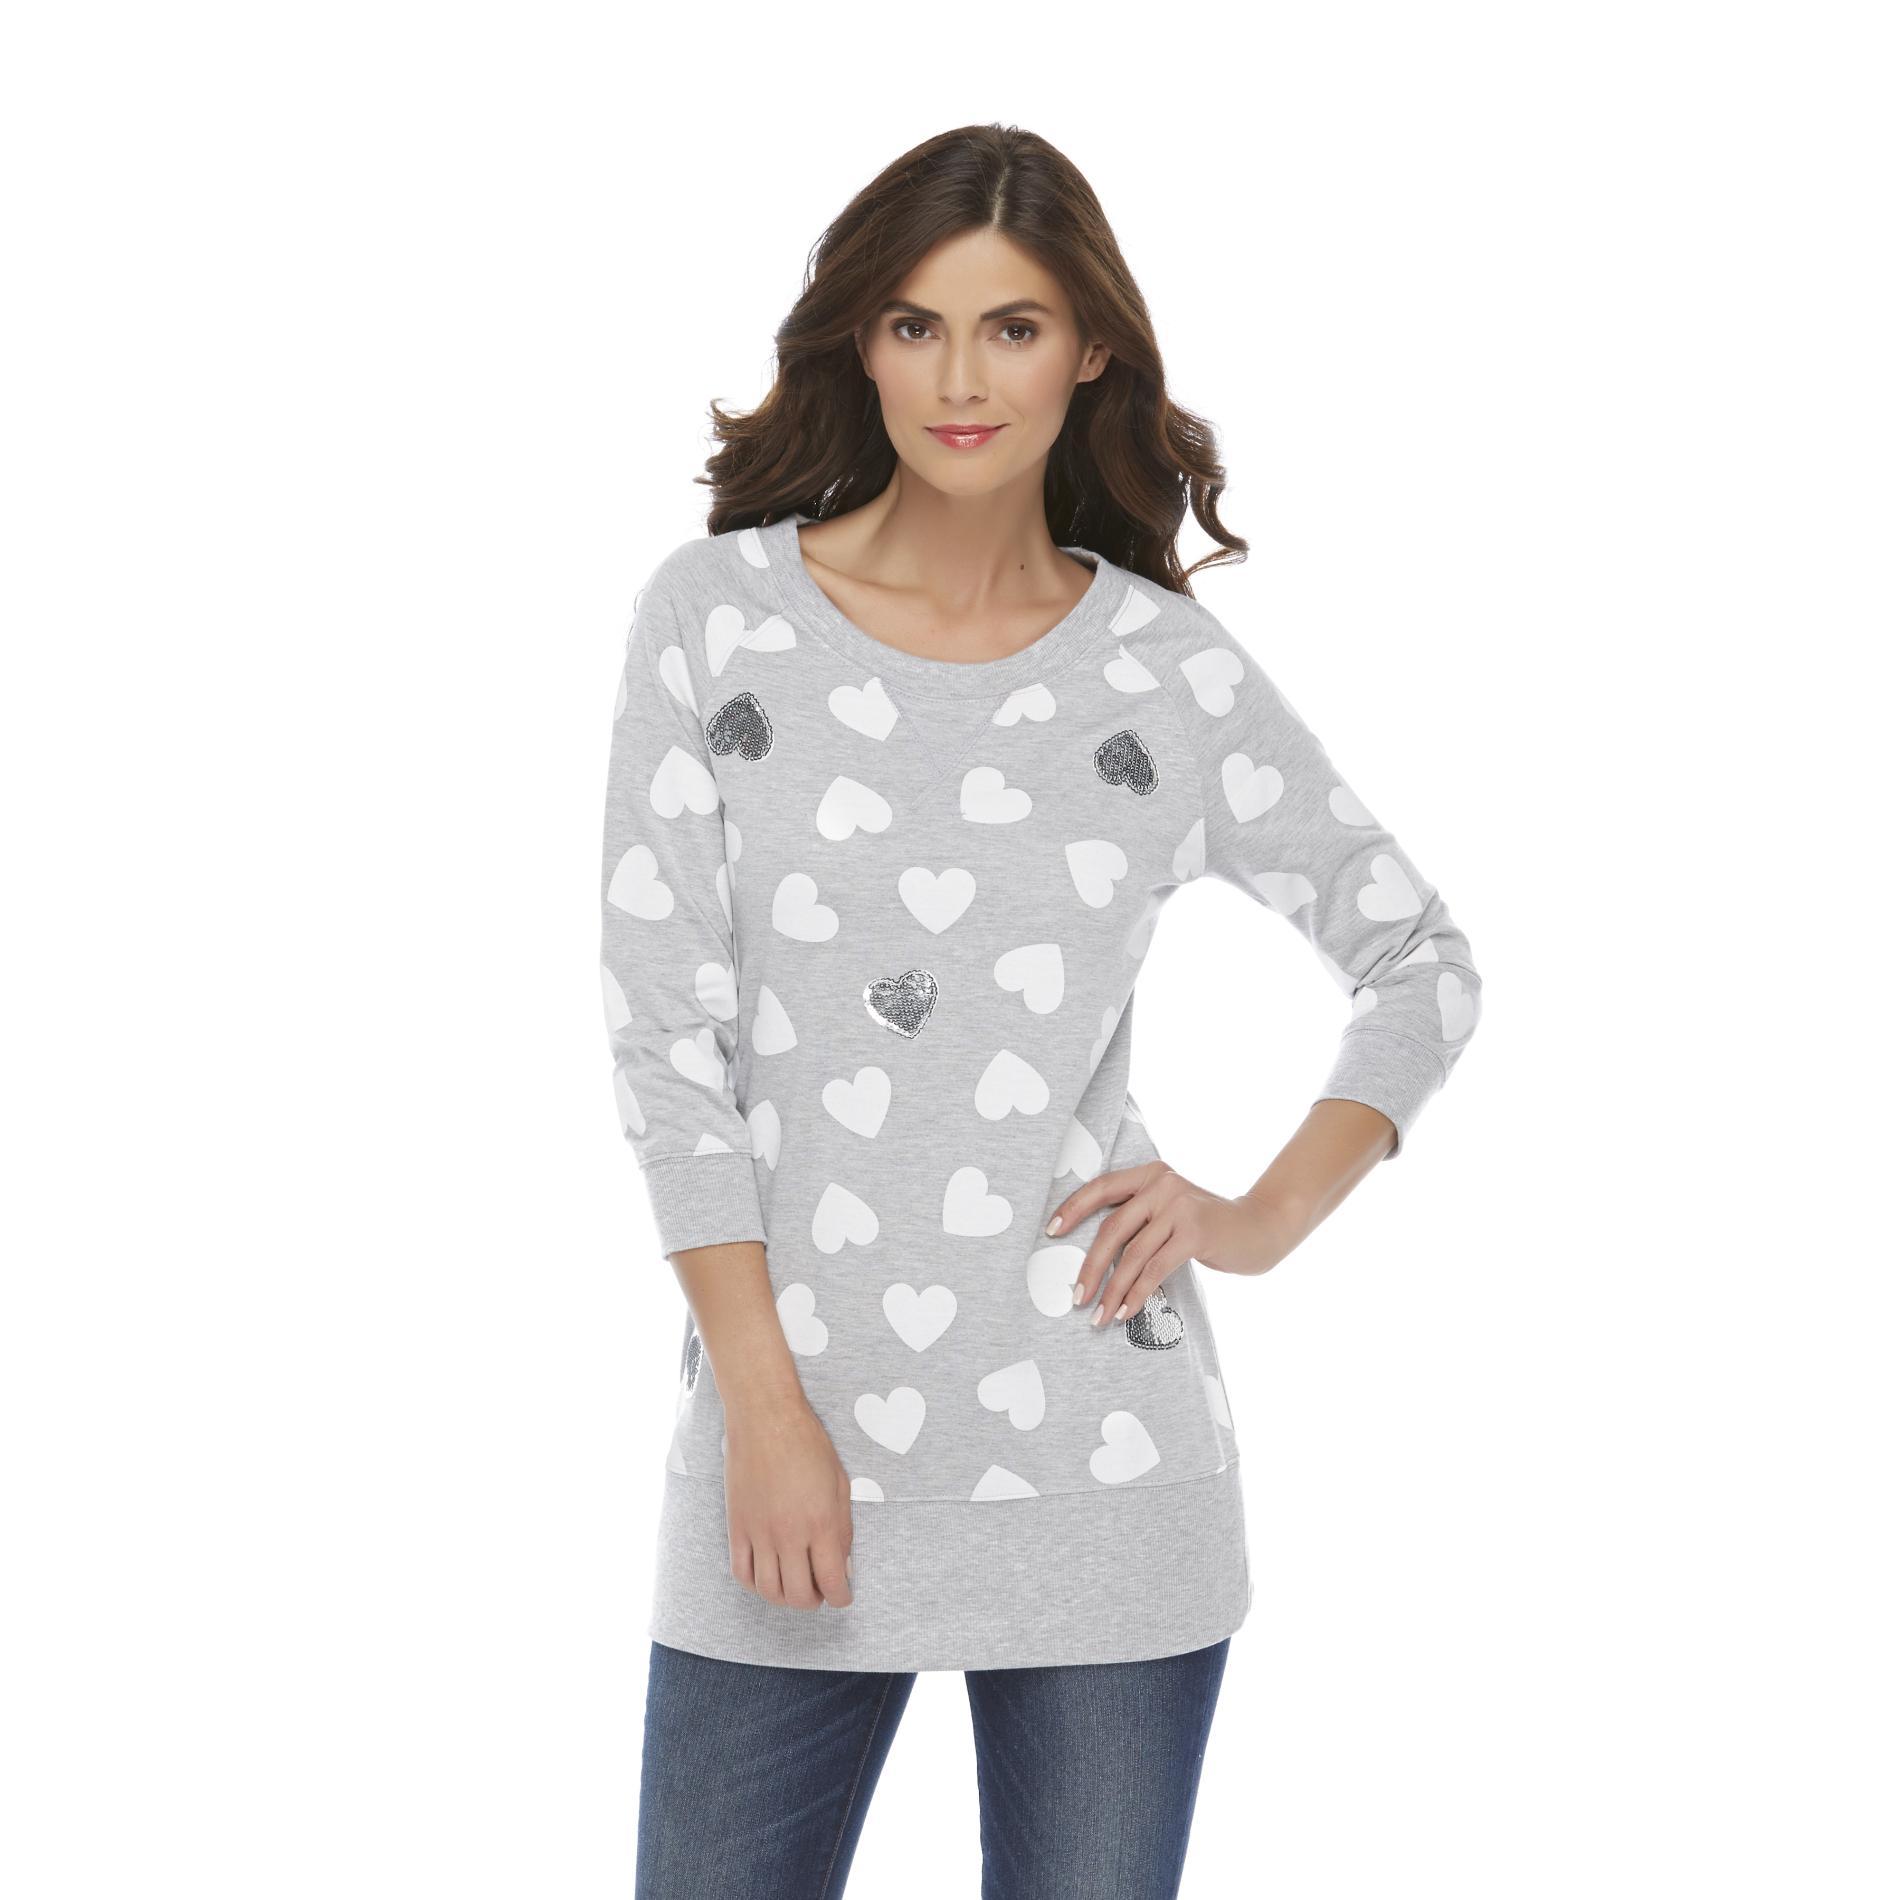 Joe Boxer Women's Graphic Sweatshirt at Sears.com